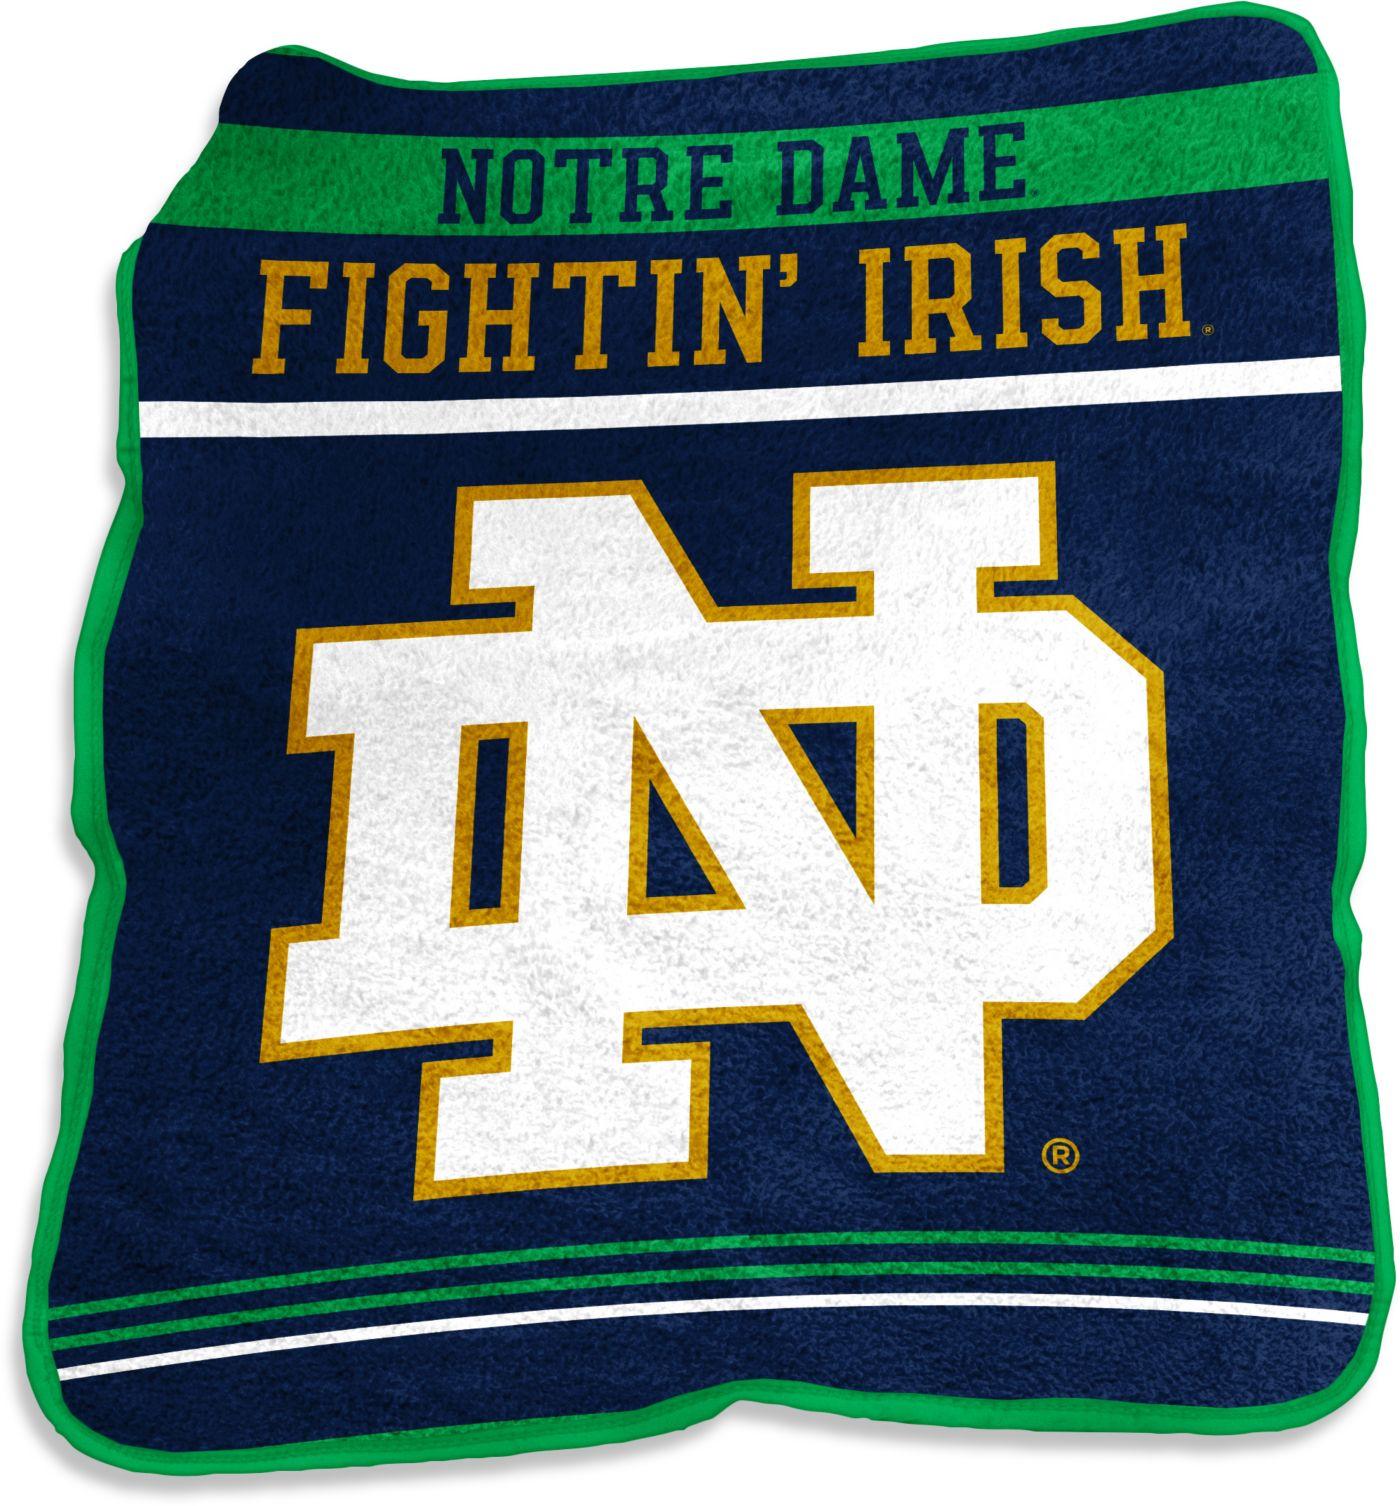 Notre Dame Fighting Irish Game Day Throw Blanket